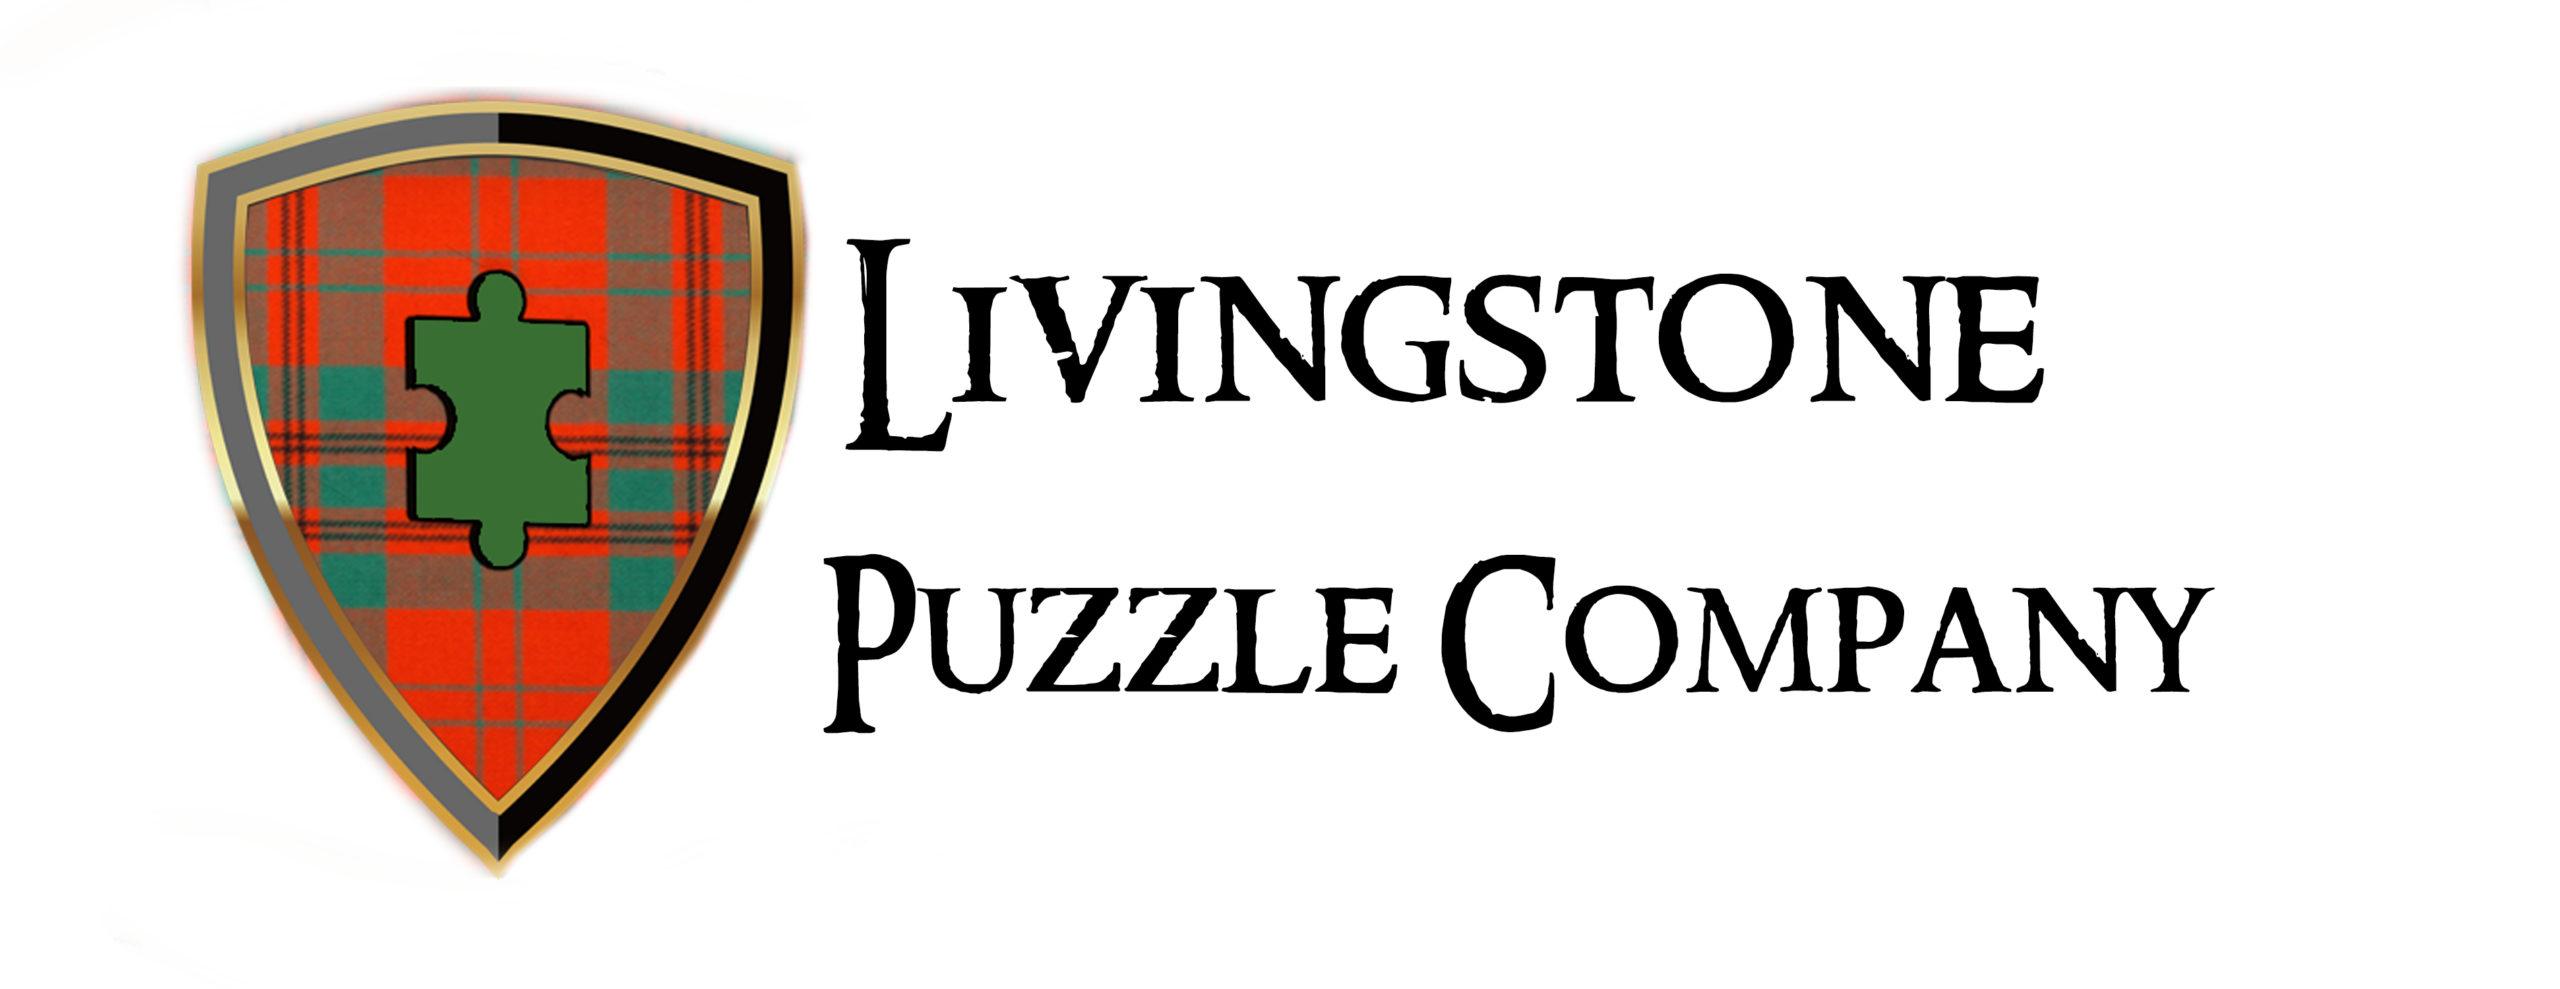 Livingstone Puzzle Company